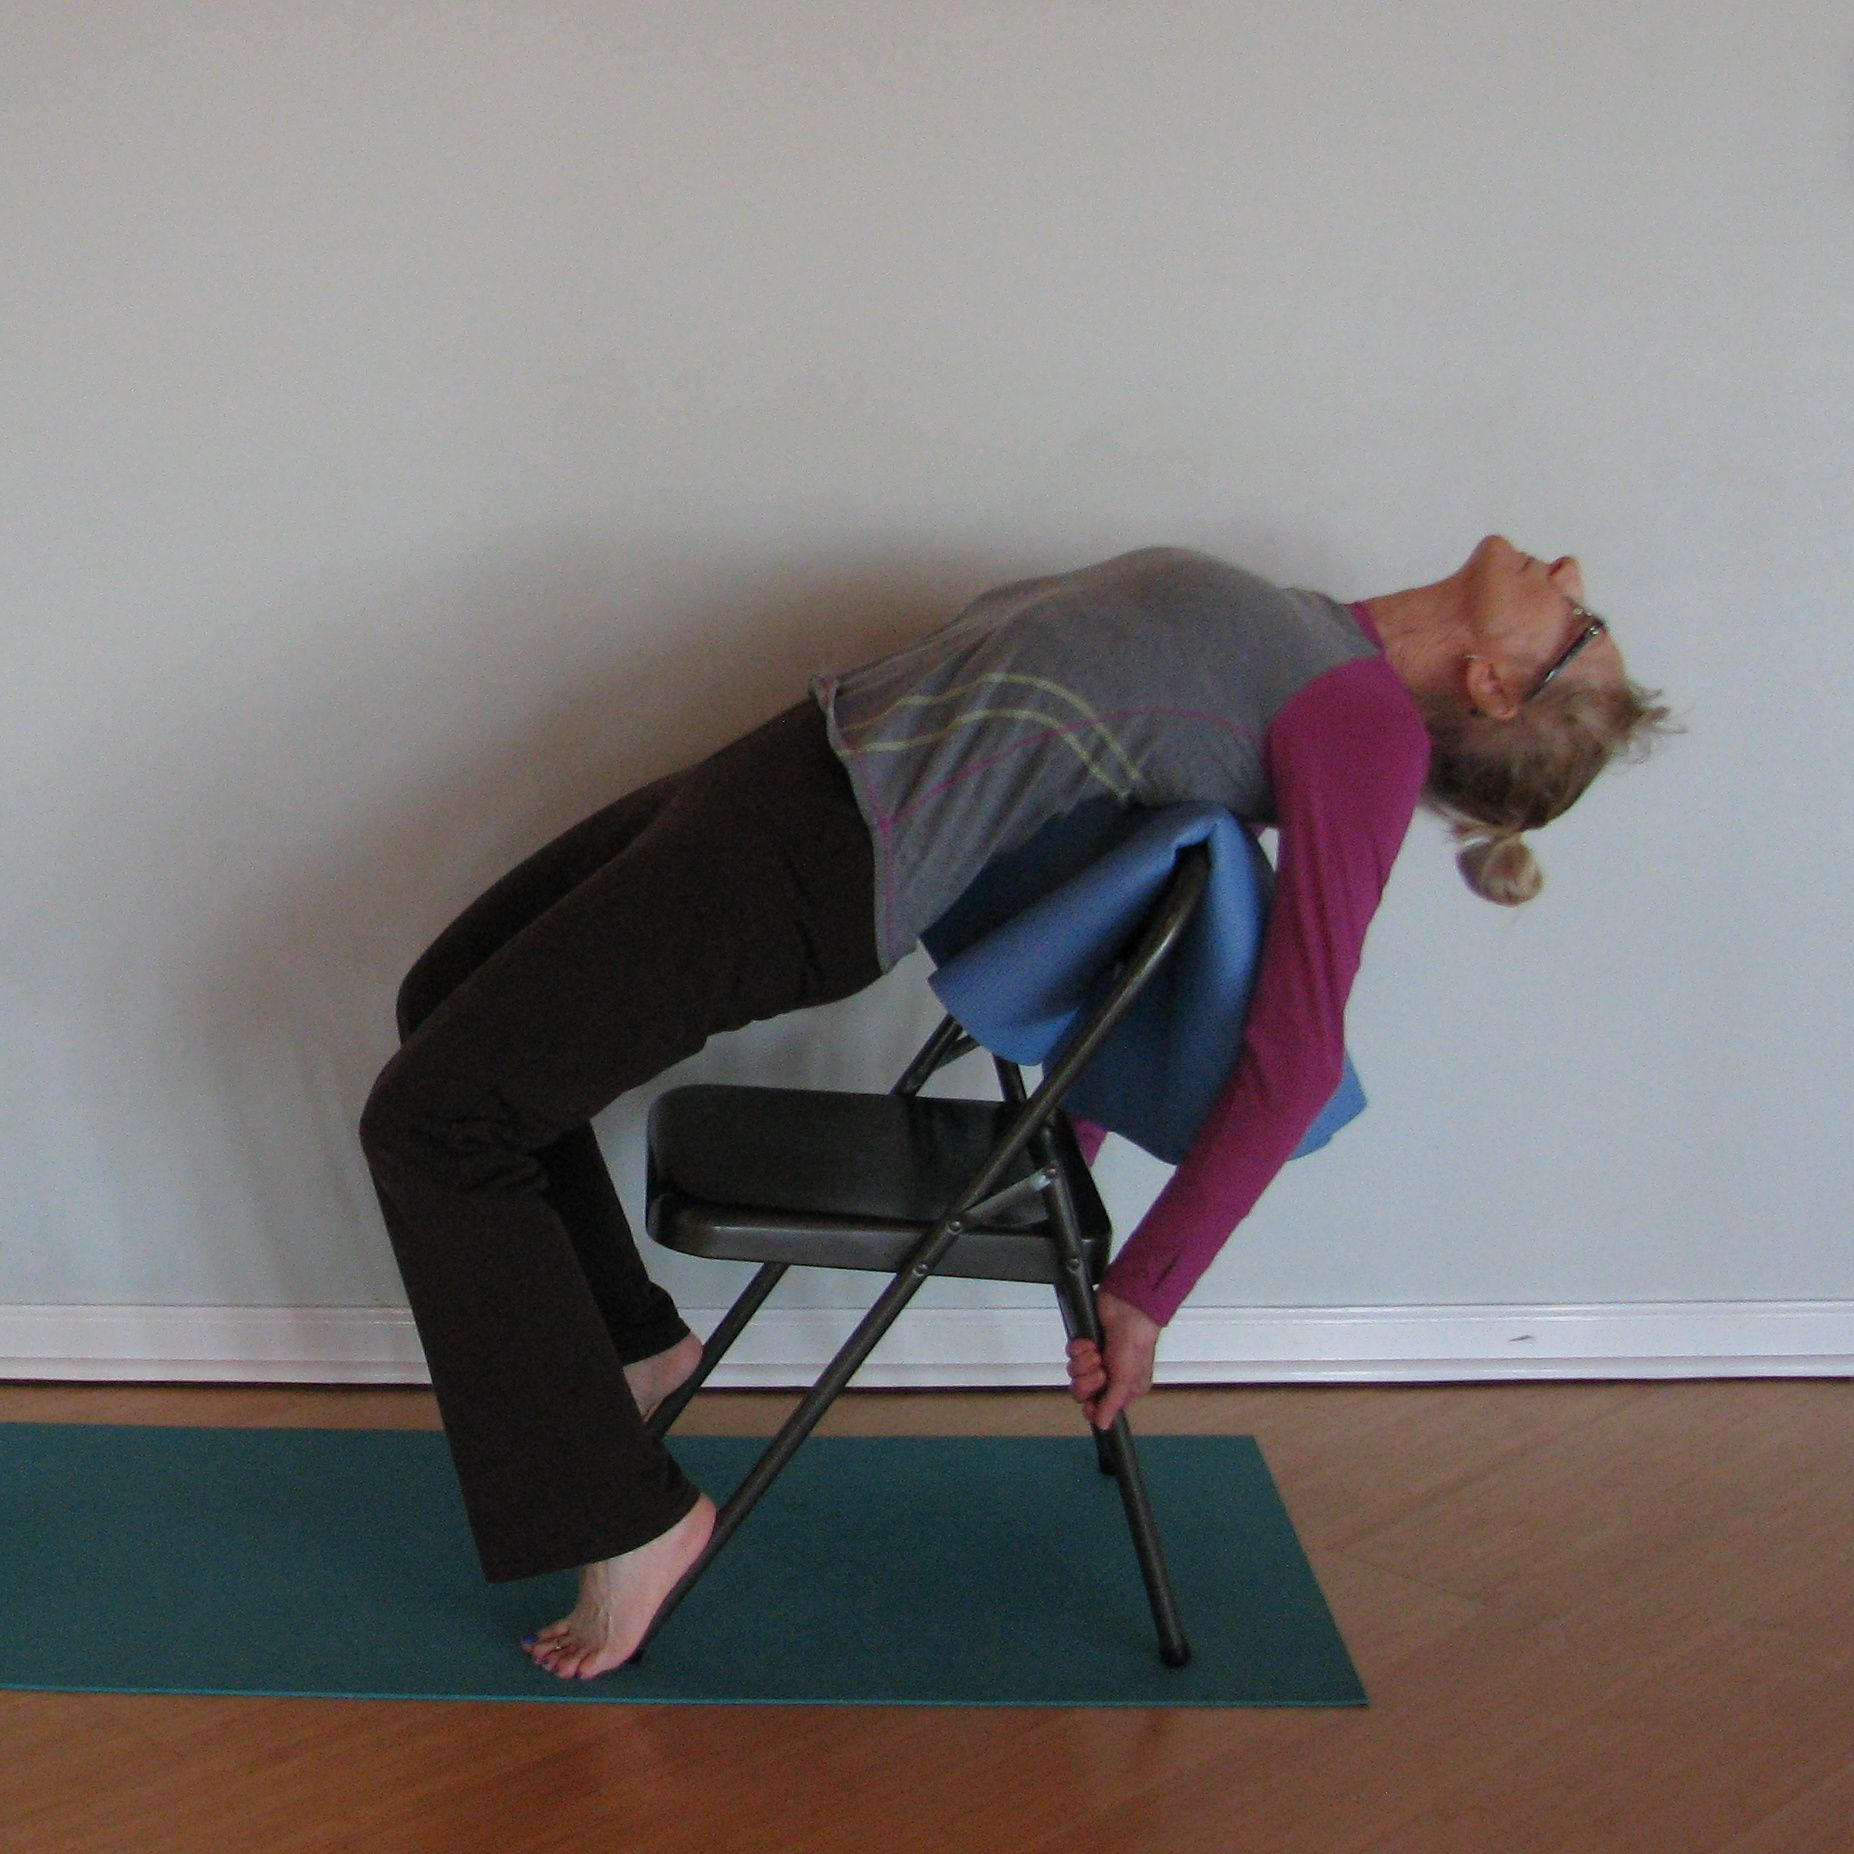 Back Bend Chair Wheel Feet On Chair Legs Hands Grip Chair Legs Arch Over Mat Bend Chair Chair Chair Legs